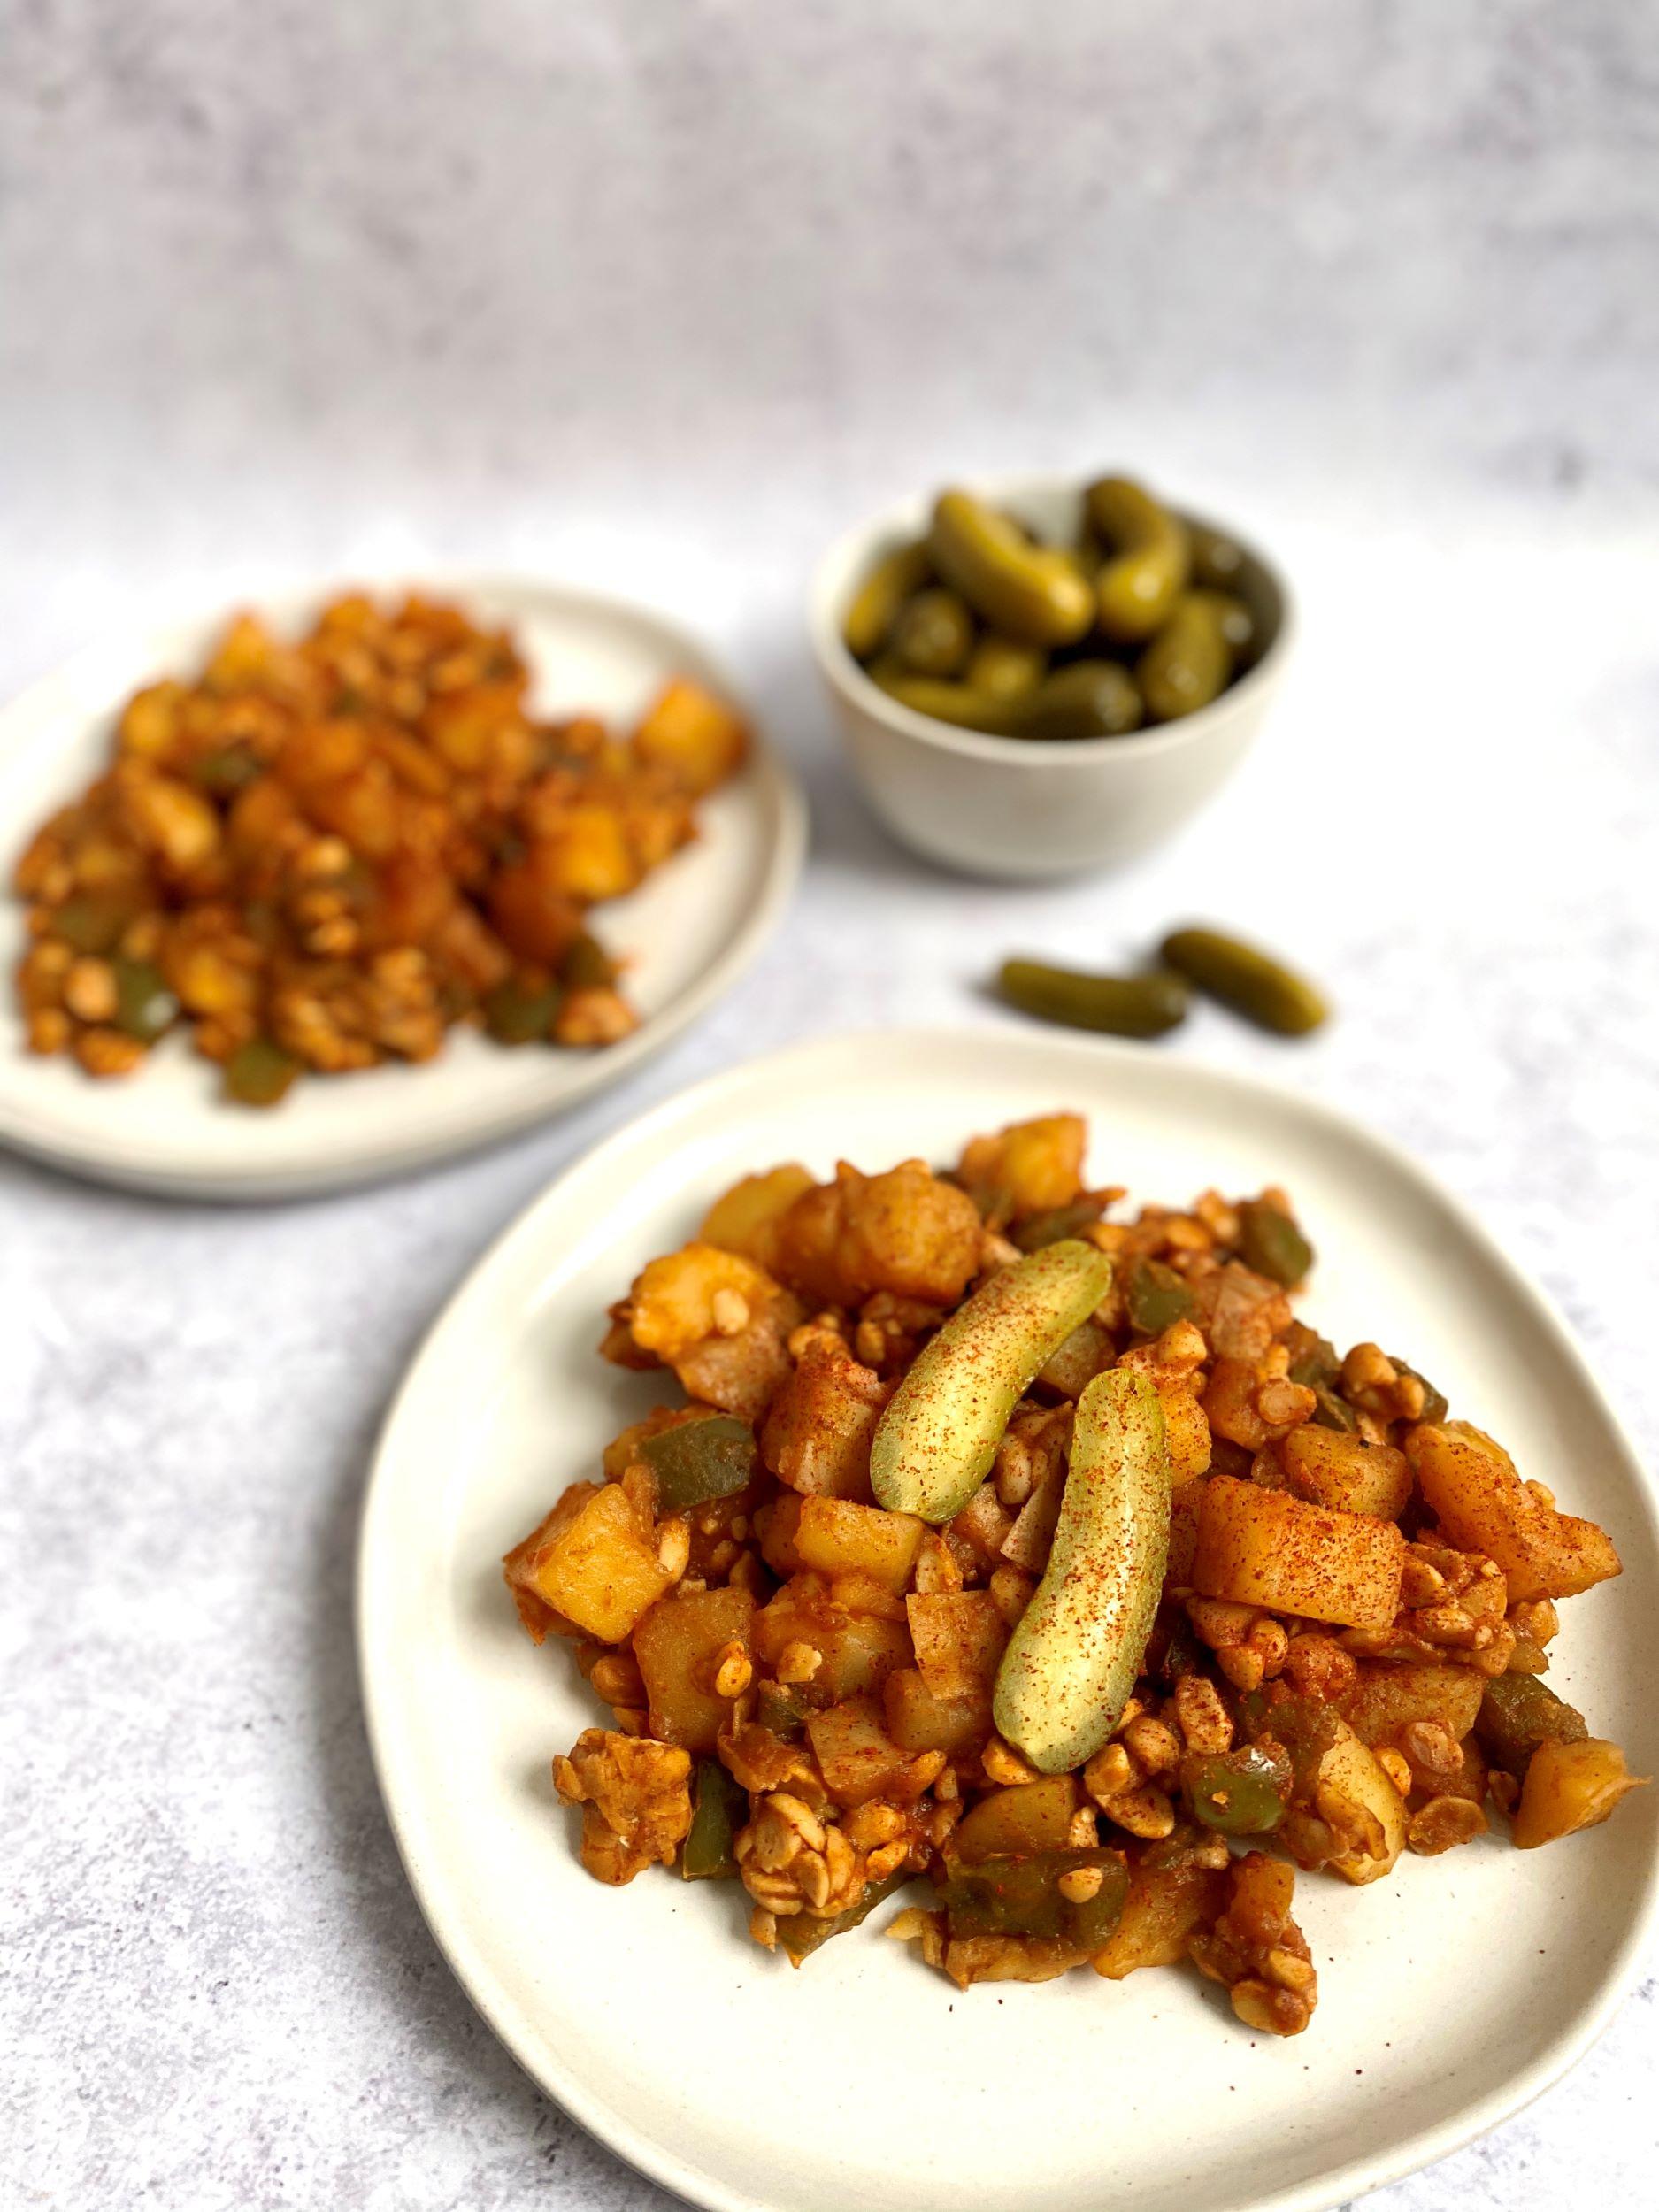 Hungarian Pan-Cooked Potatoes with Paprika